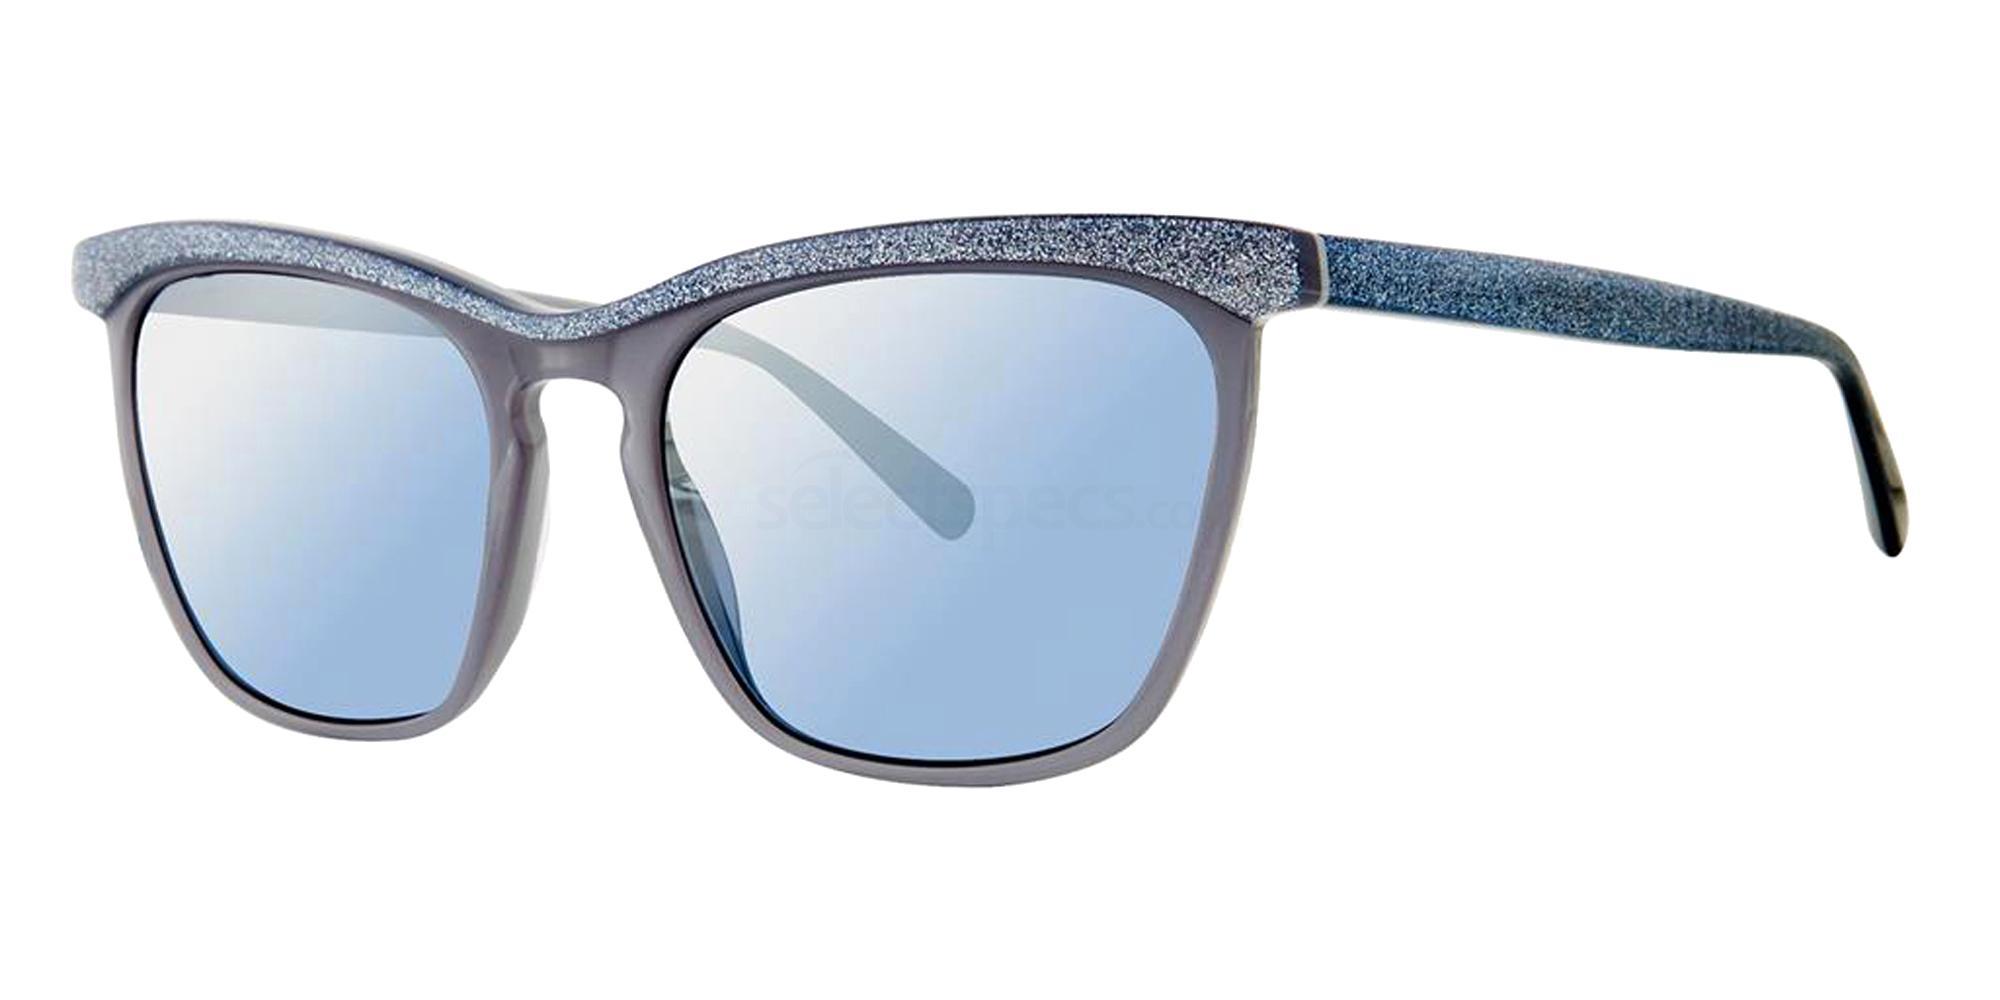 Dove Shimmer RILYNN Sunglasses, Vera Wang Luxe